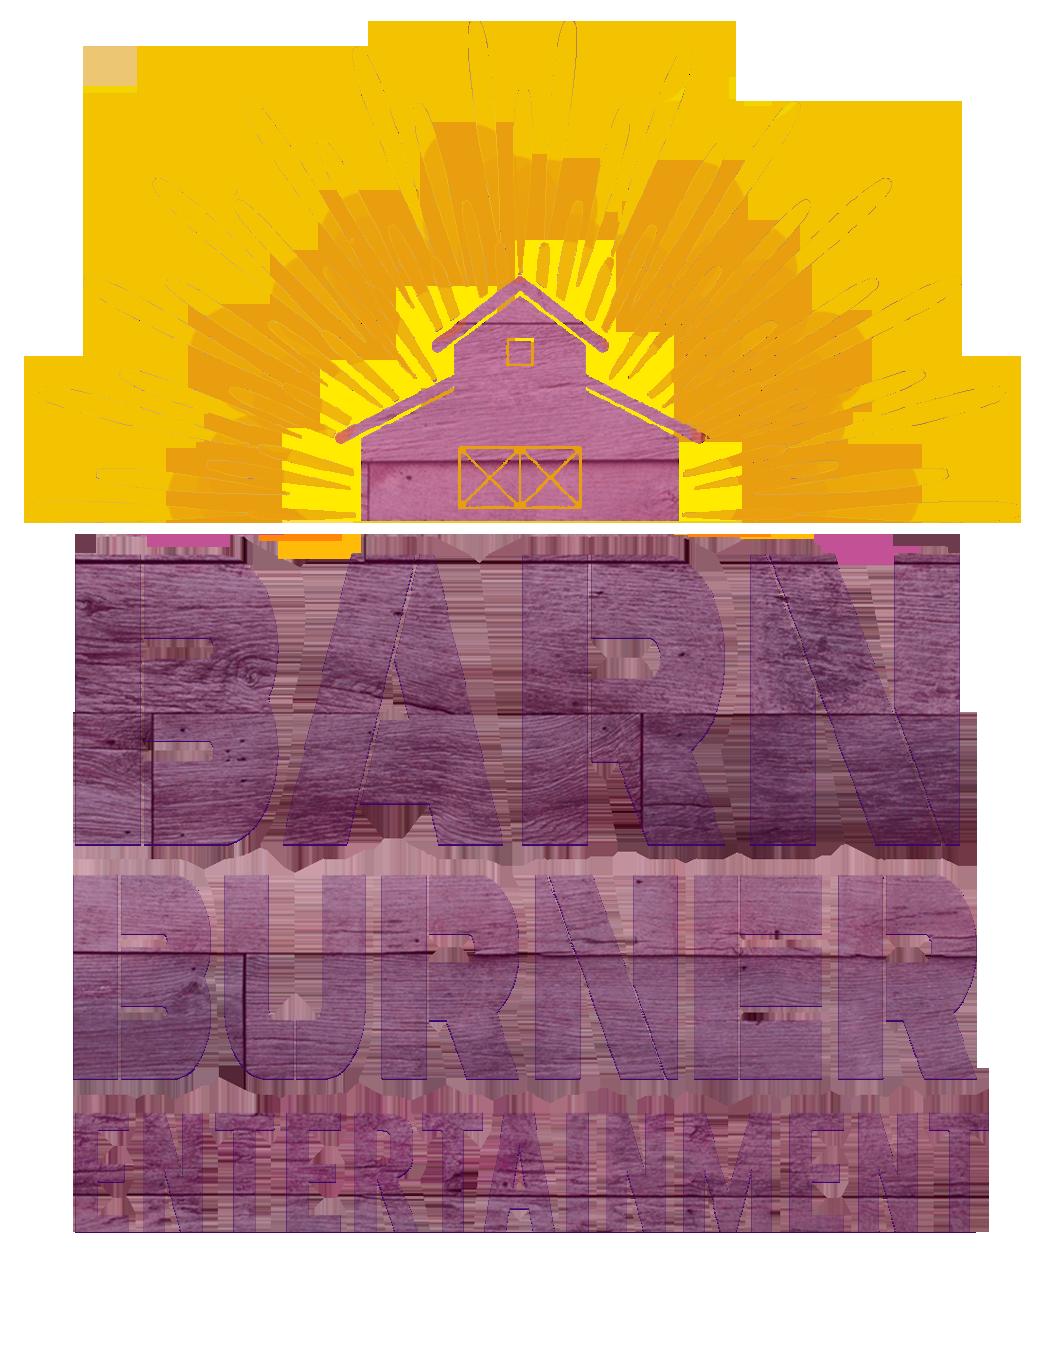 About Barn Burner Entertainment